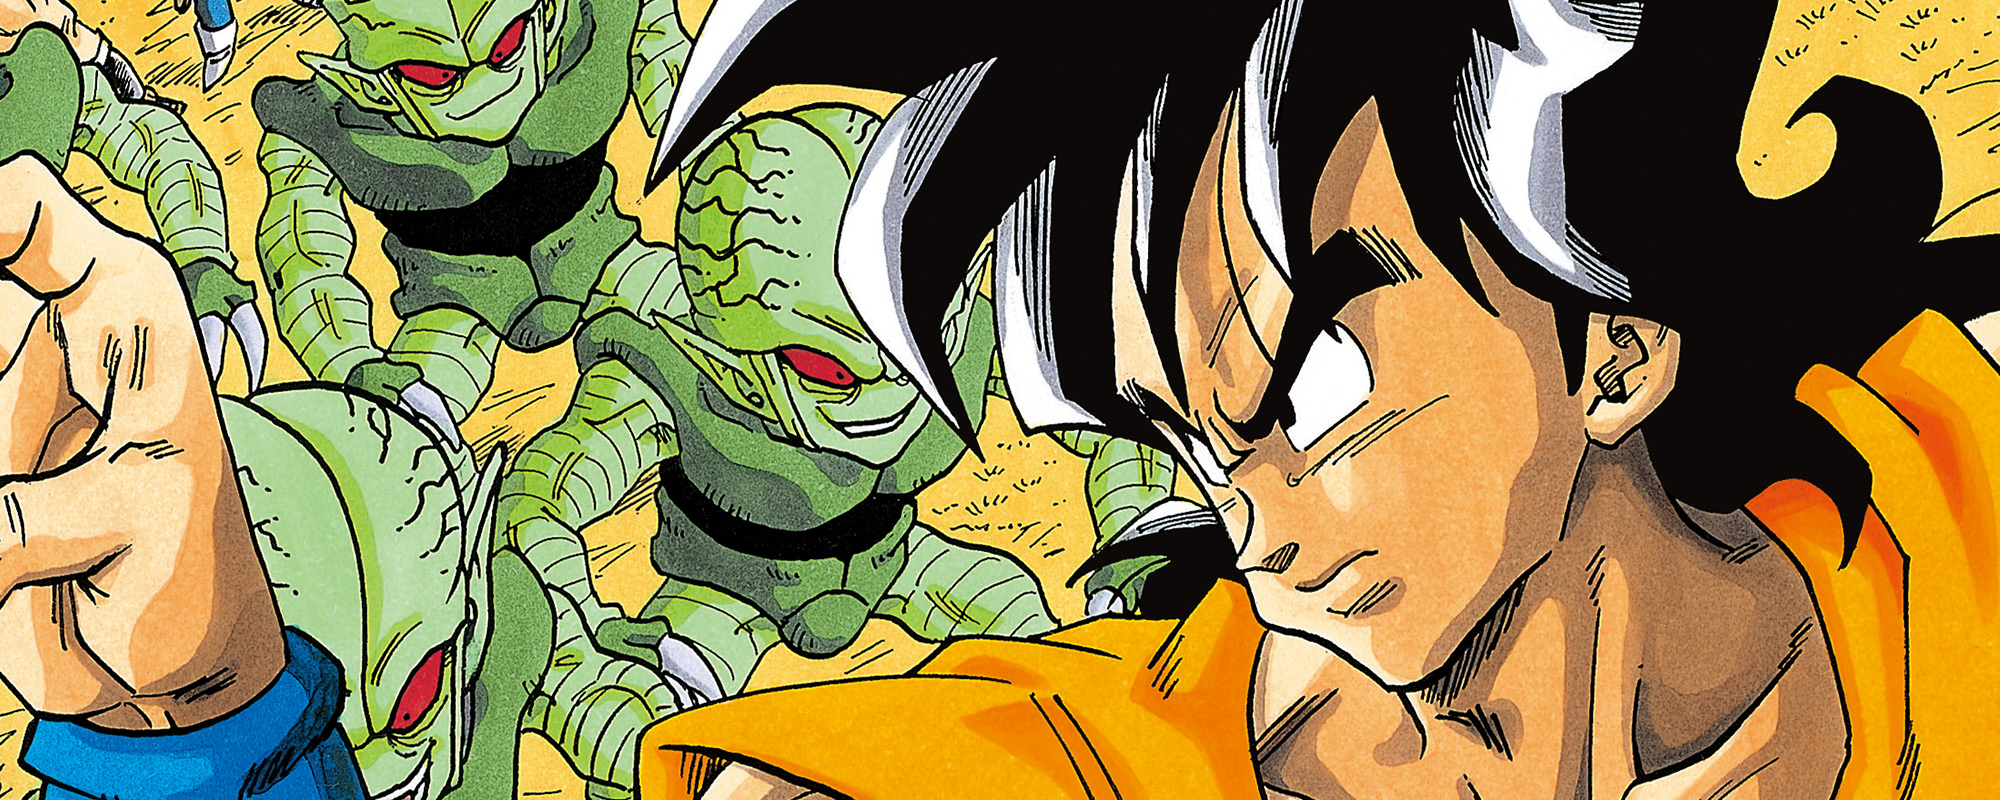 VIZ | Read Dragon Ball: That Time I Got Reincarnated as